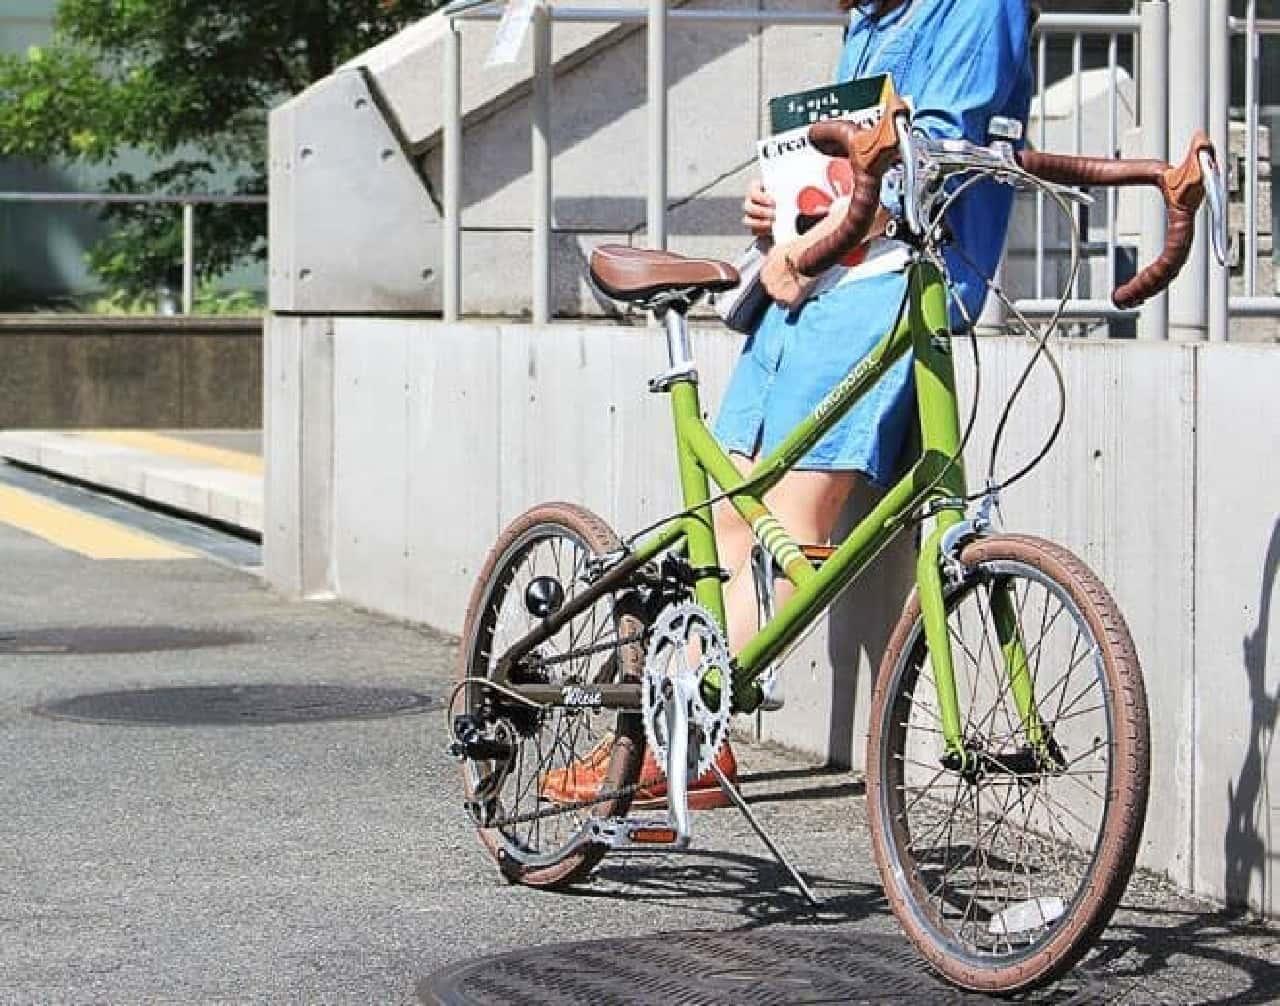 「Wiese(ヴィーゼ)」は、暮らしにちょっとしたレトロ感をプラスしてくれる自転車